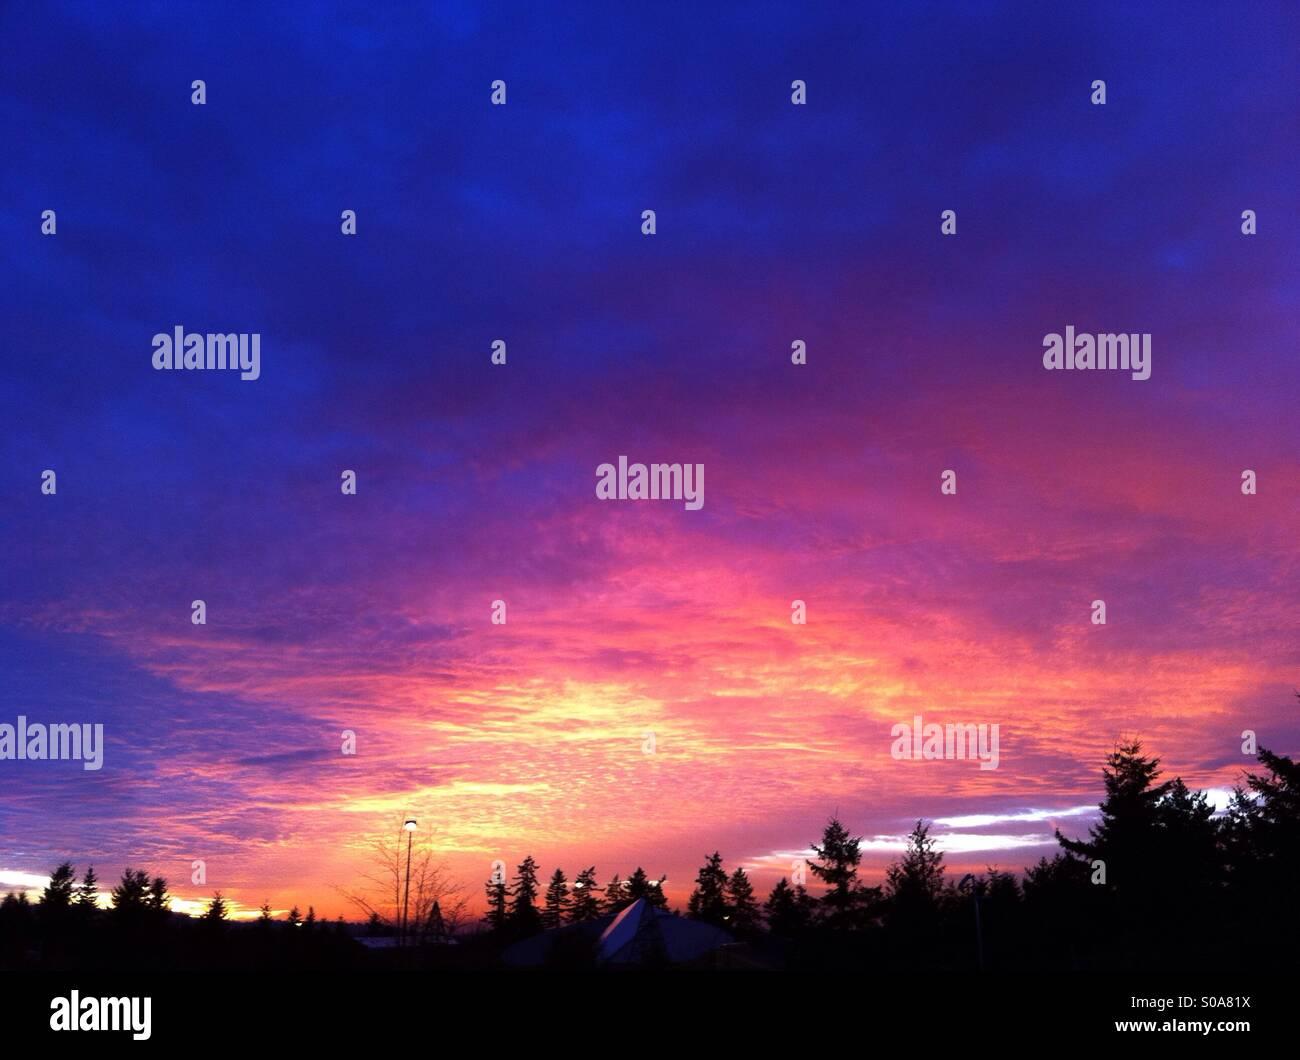 Magenta sunset - Stock Image